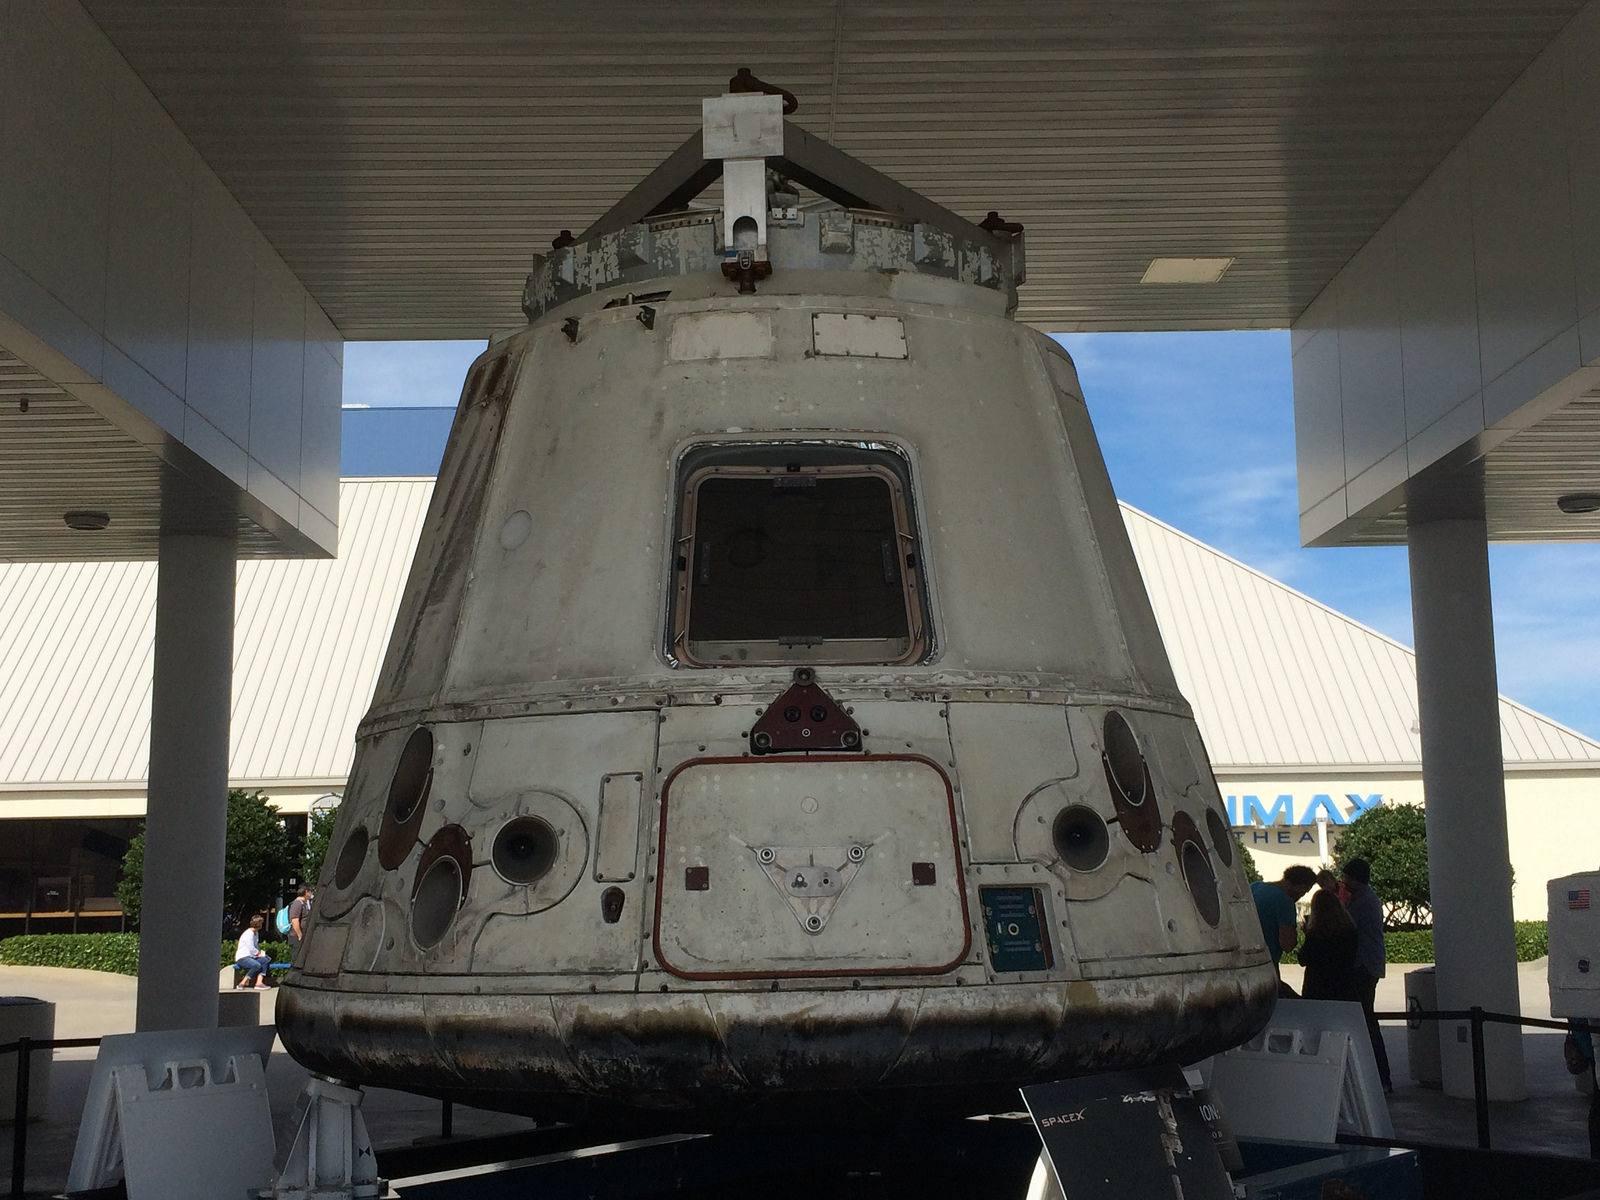 kennedy space center13 Kennedy Space Center   Popular Destination